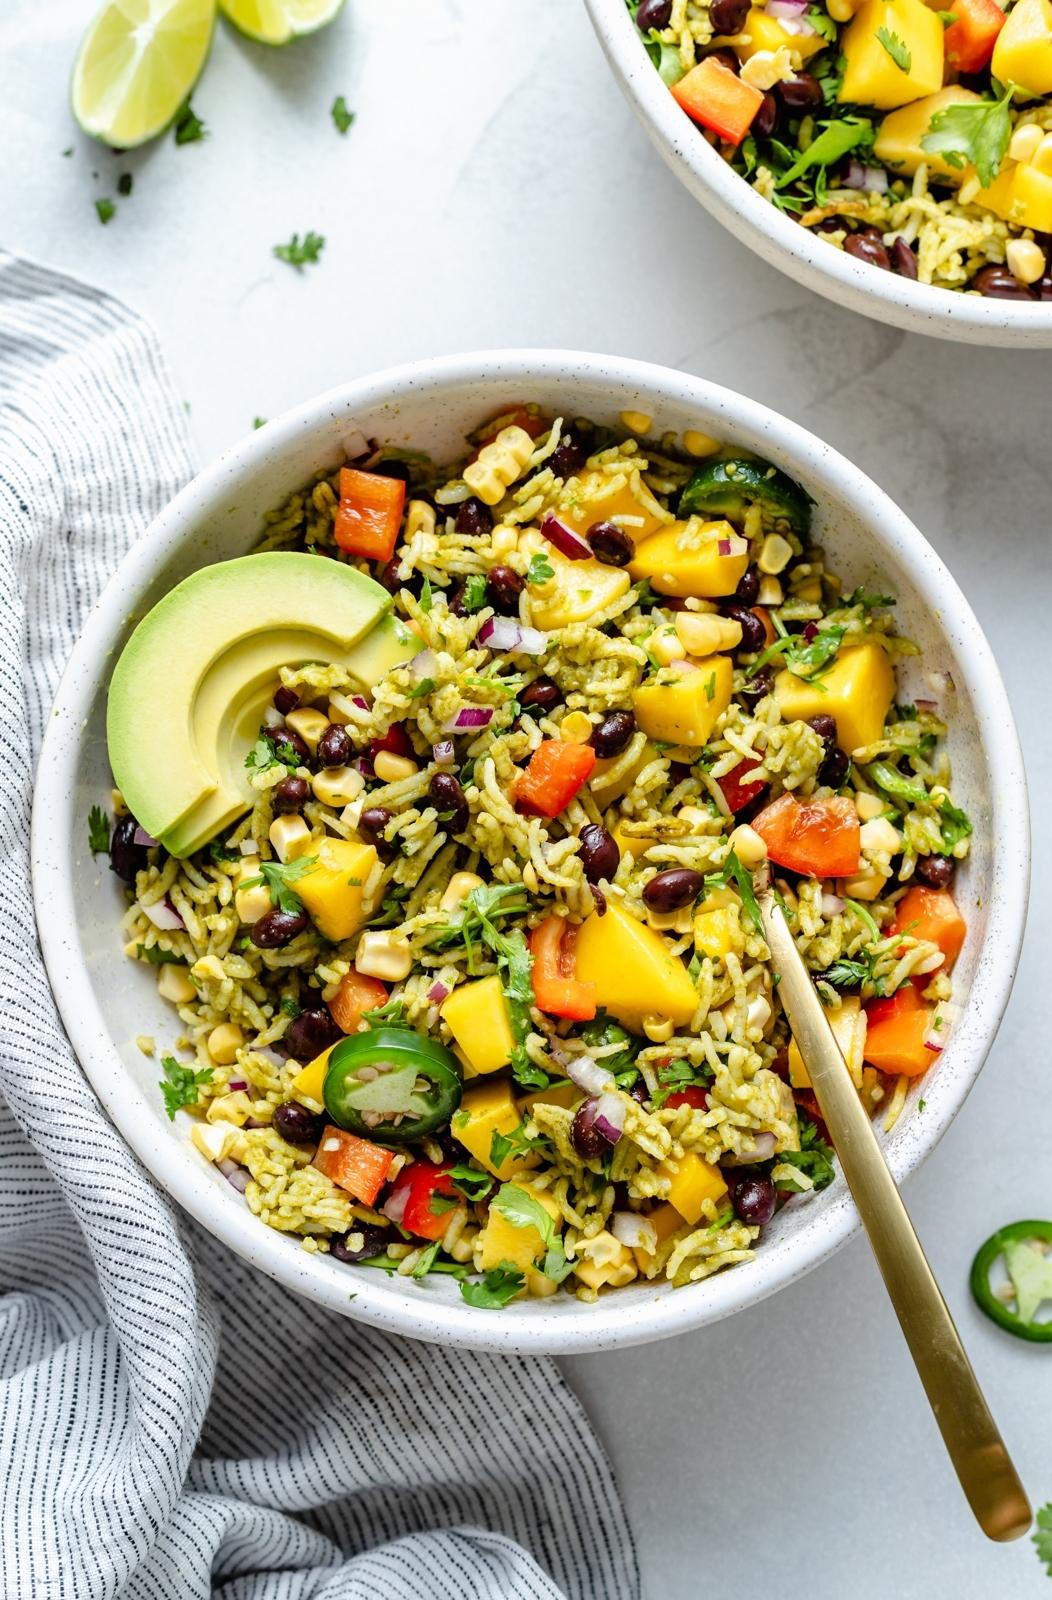 vegan green rice bowl with avocado, mango and black beans